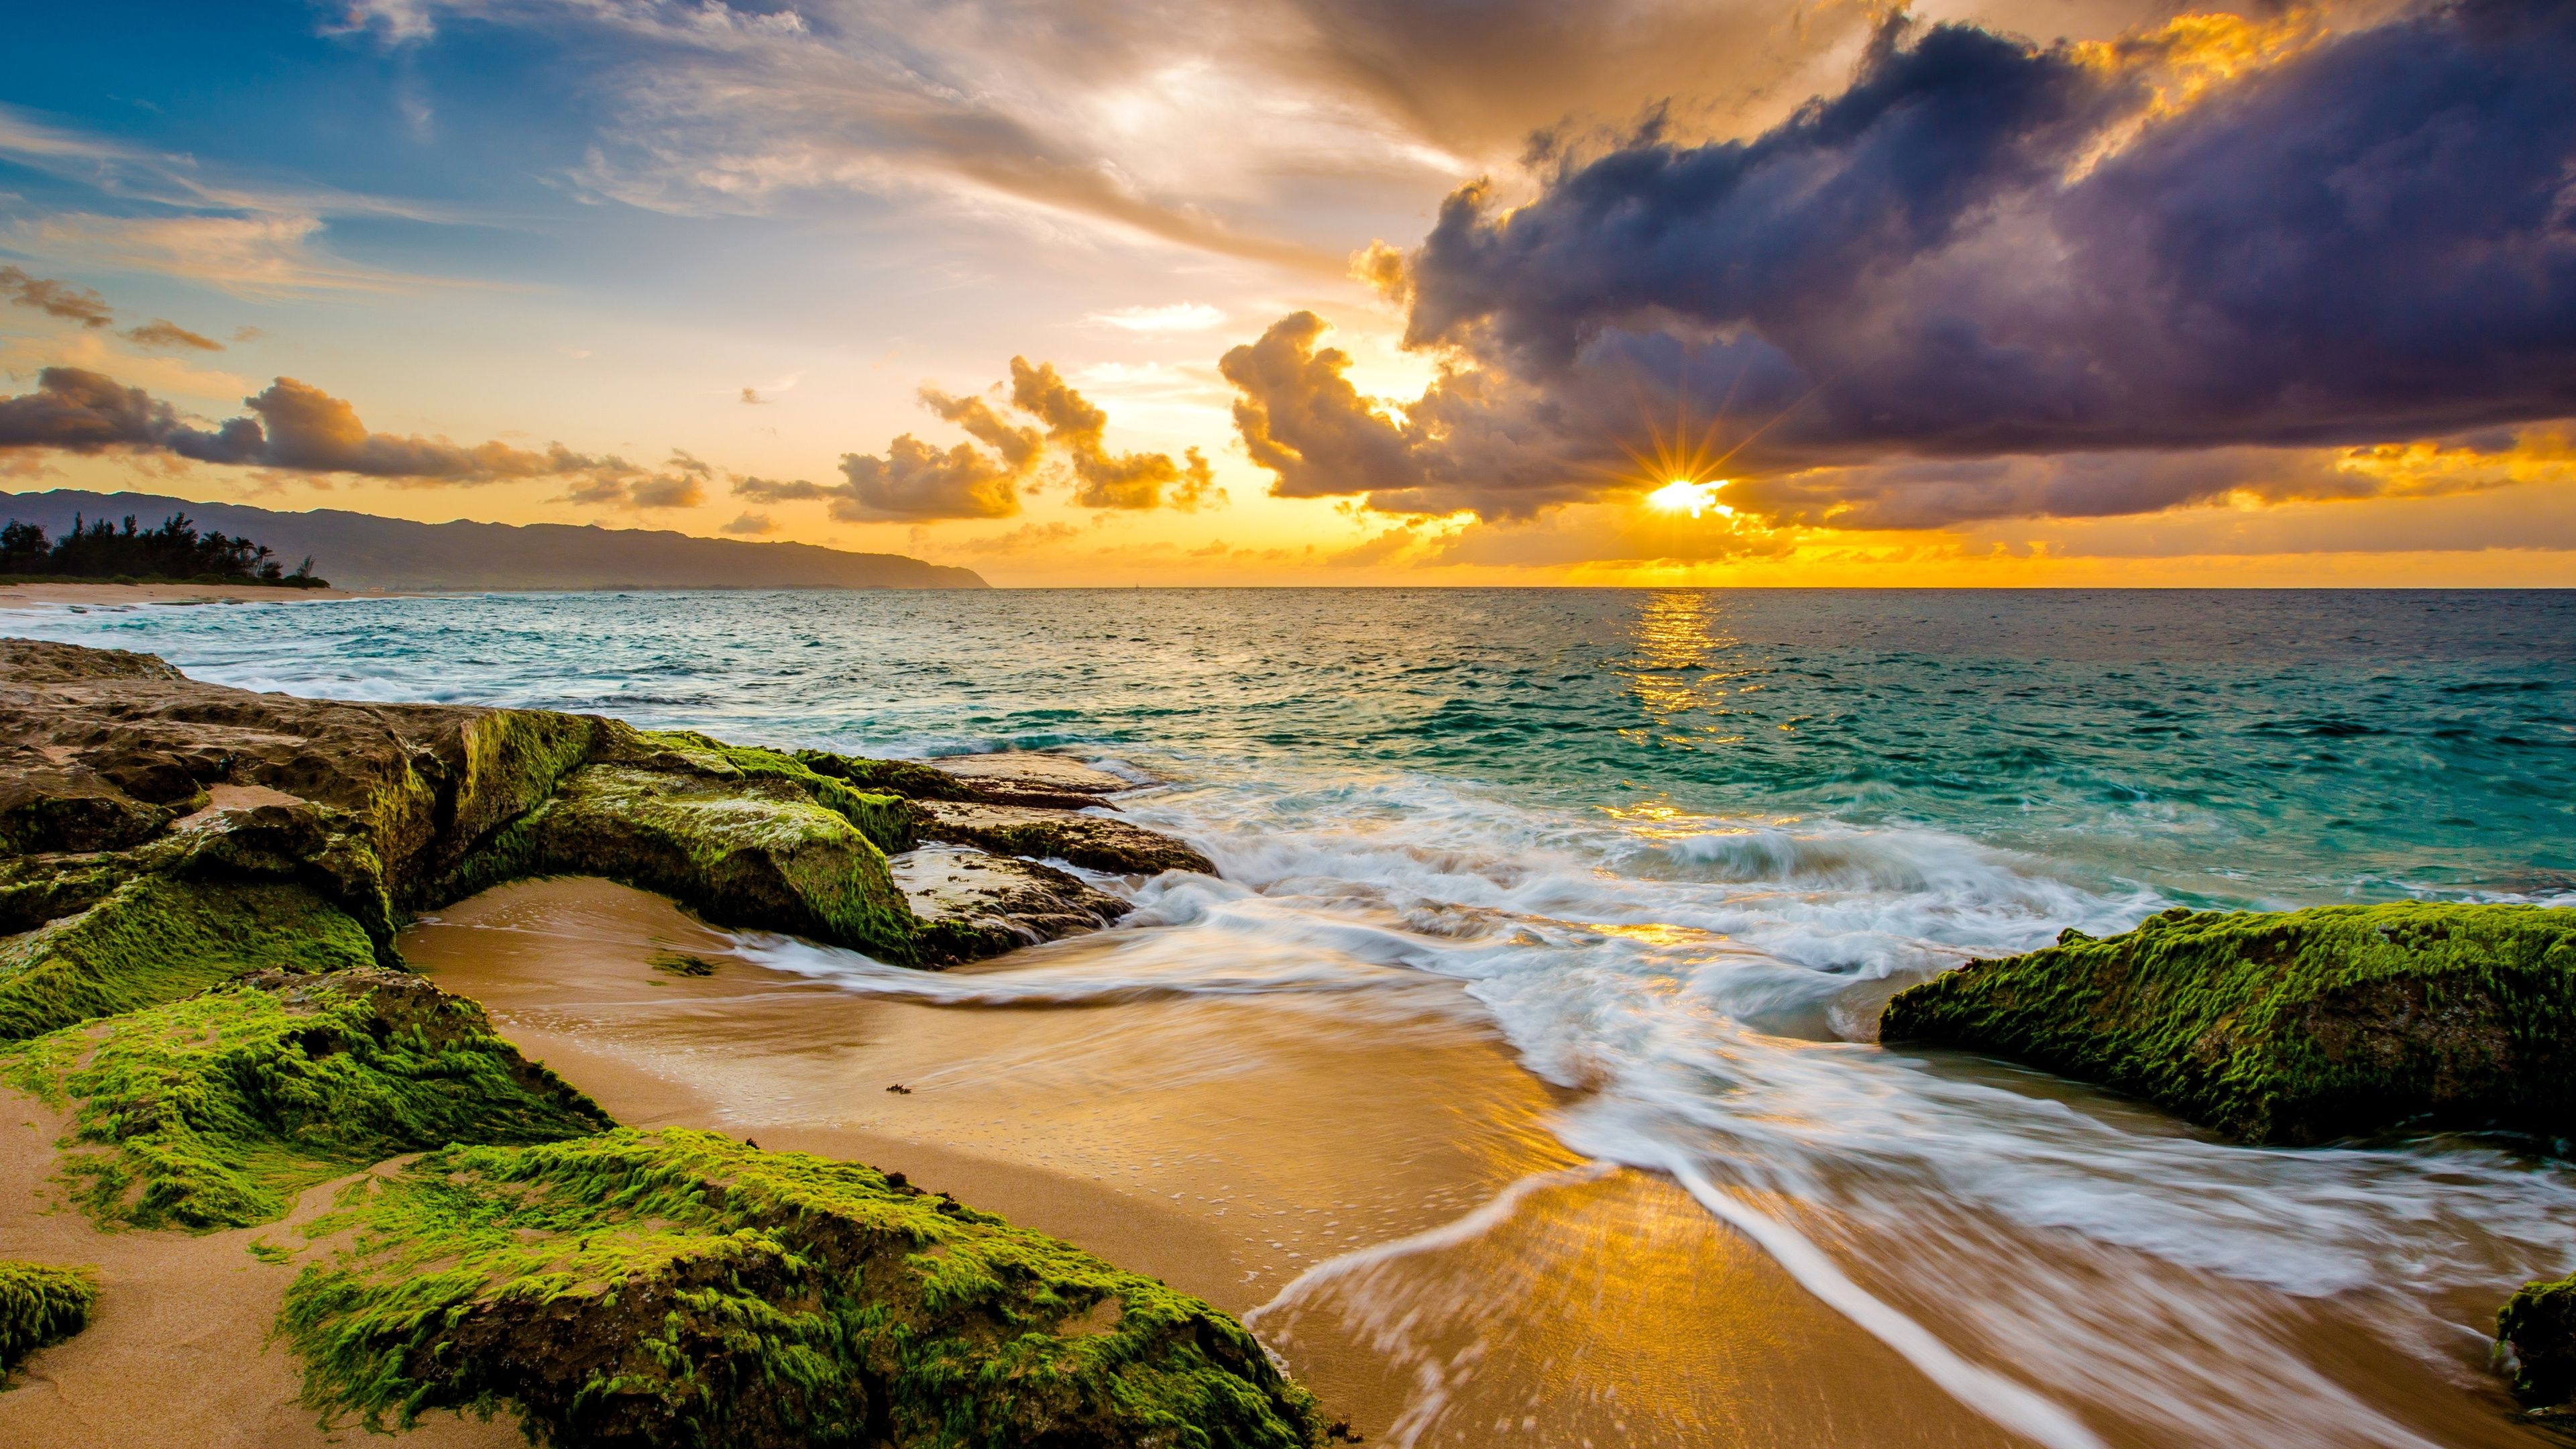 Hawaii Wallpapers Top Free Hawaii Backgrounds